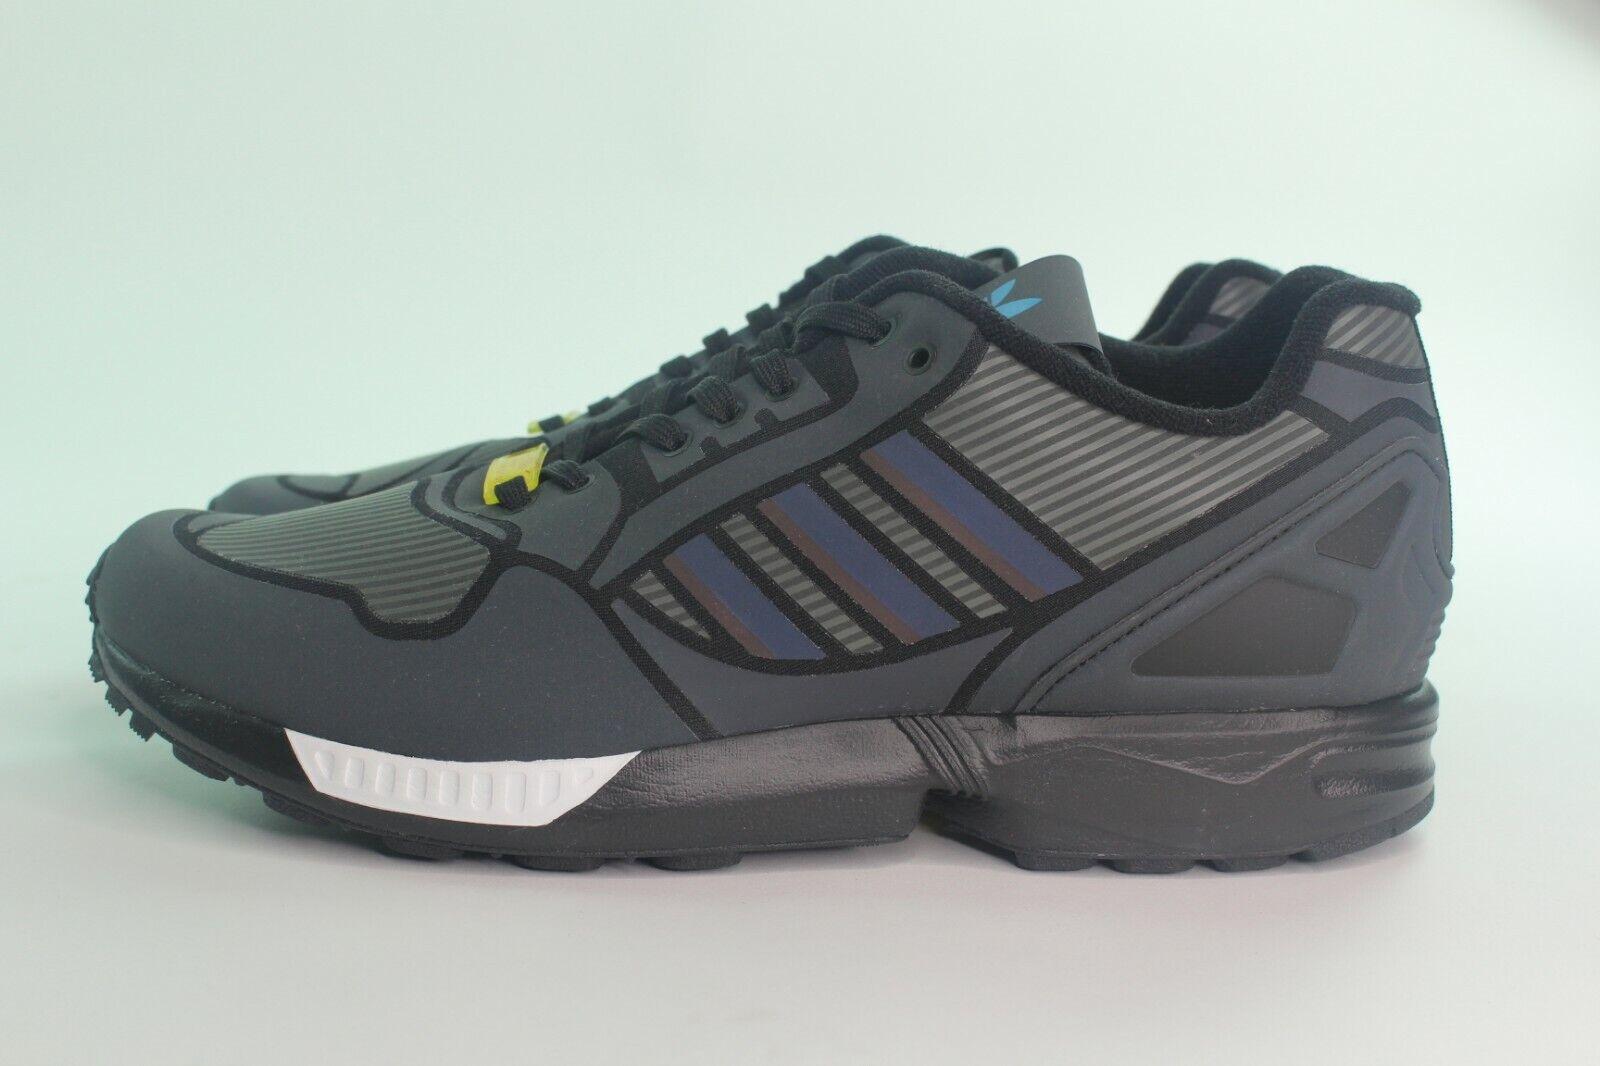 Adidas Powerlift 3.1 M BA8018